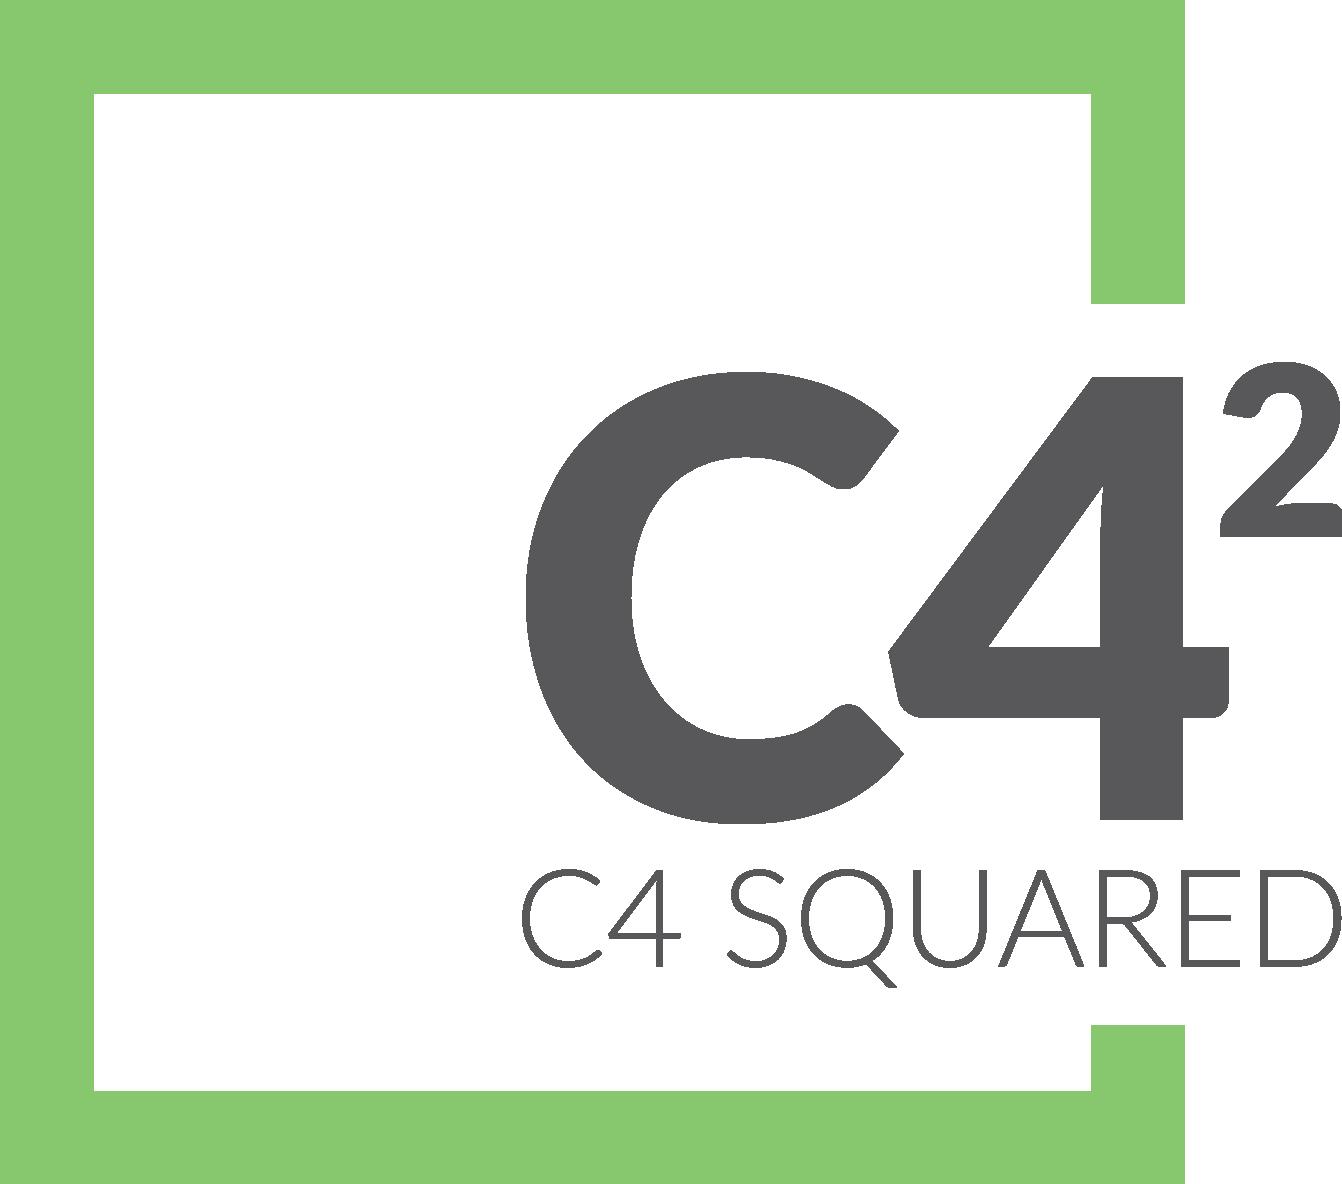 c4 squared logo